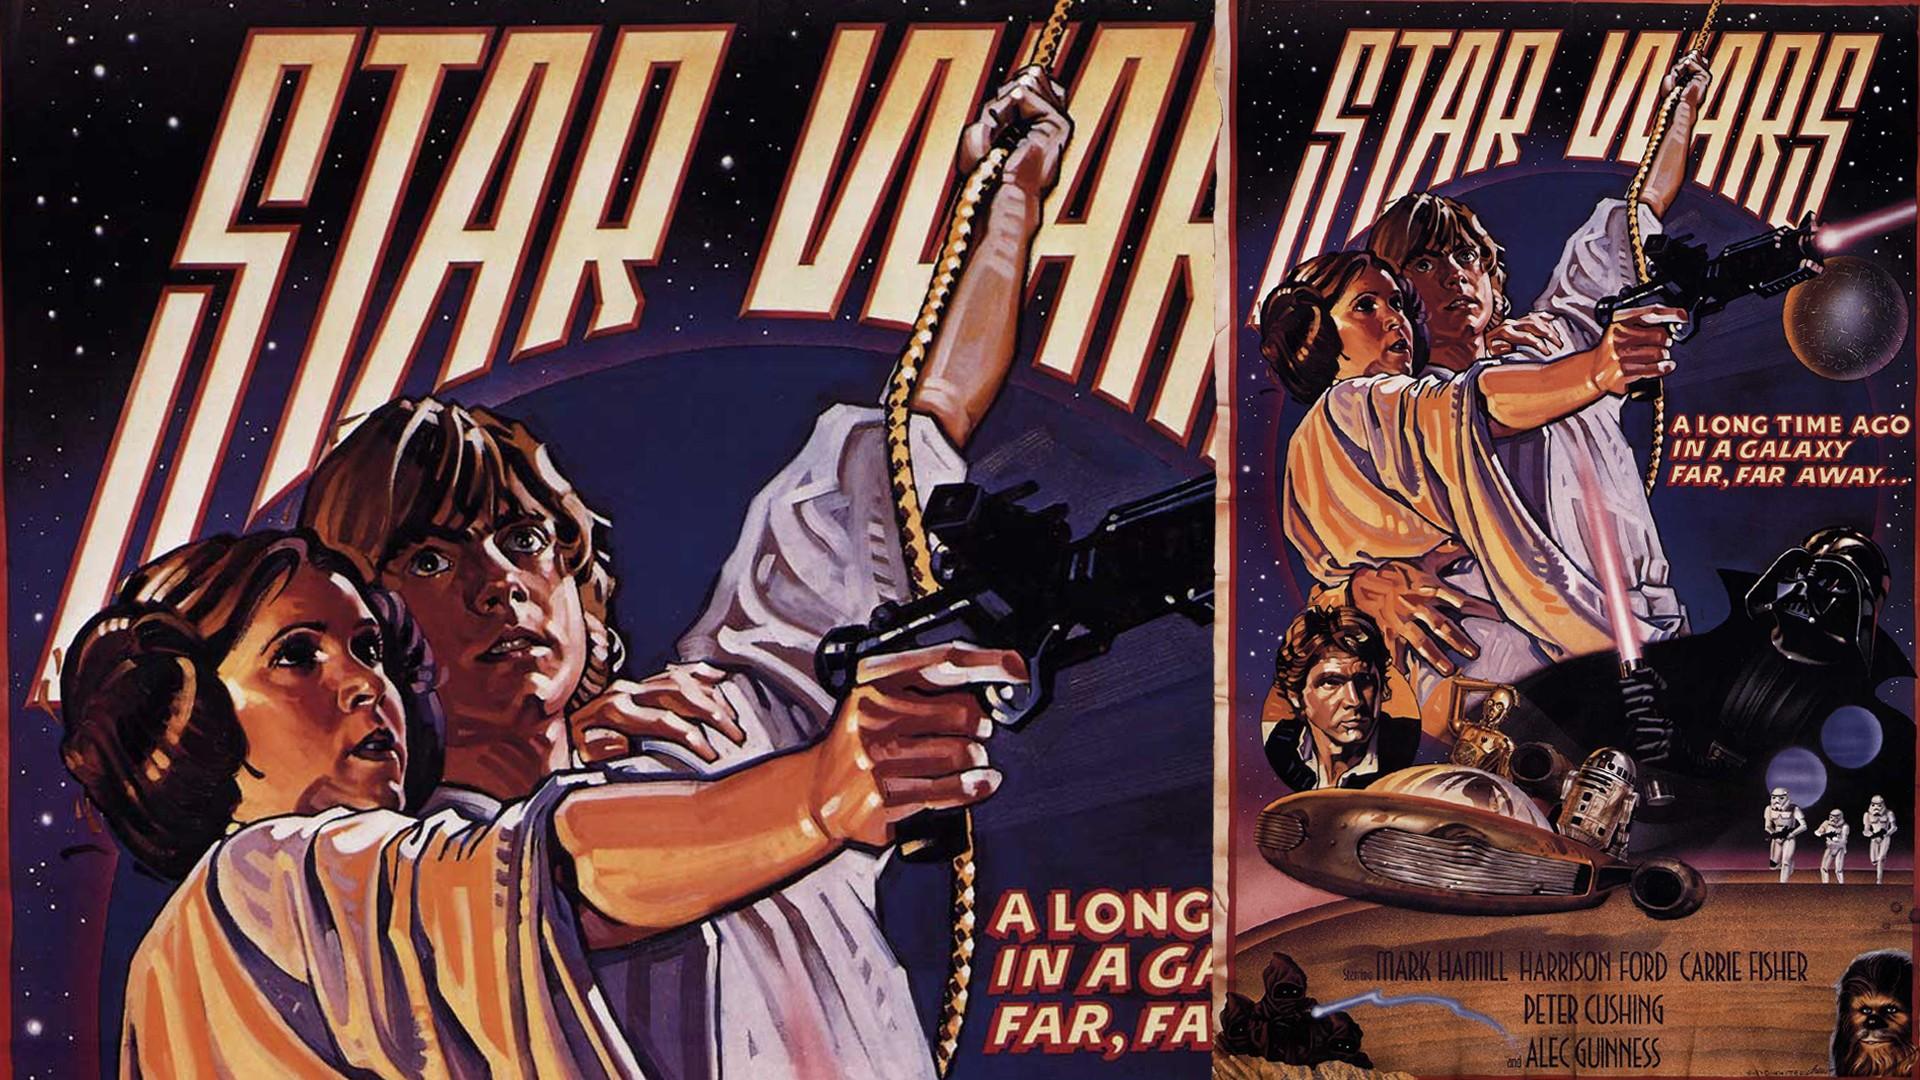 Illustration Star Wars Collage Movies Film Posters Comics Poster Luke Skywalker Leia Organa Episode